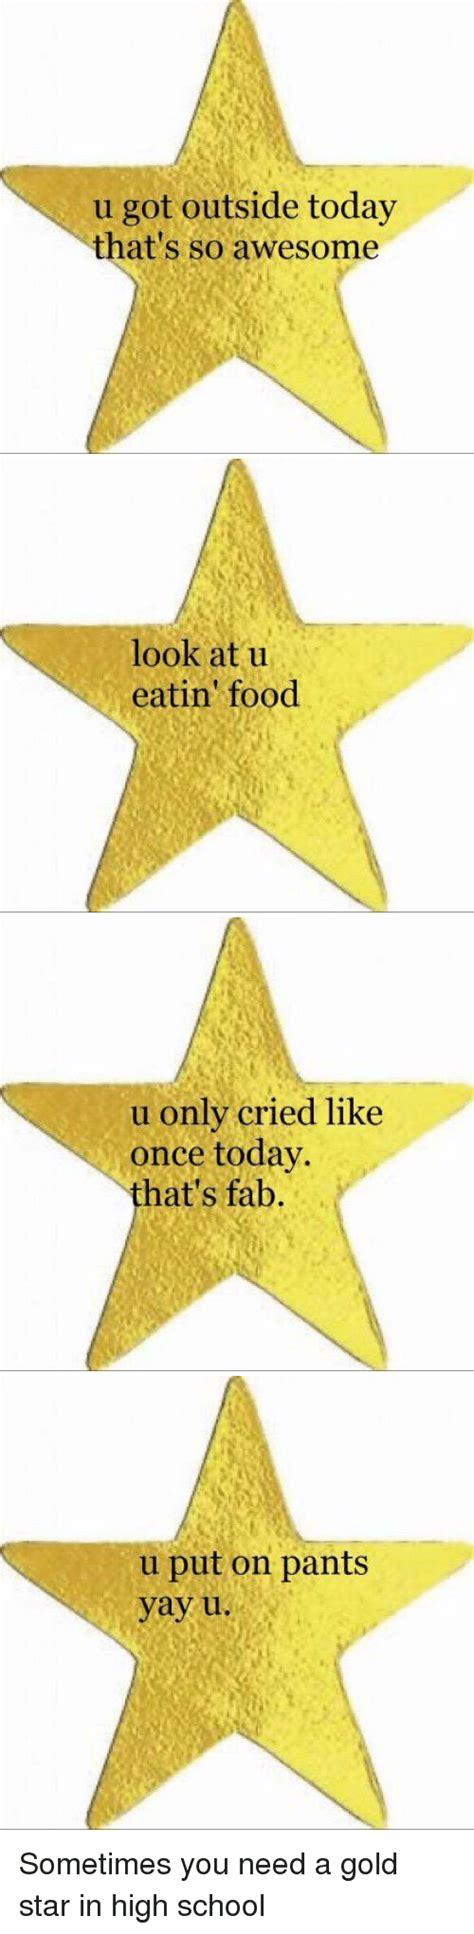 Gold Star Meme - gold star you did it www pixshark com images galleries